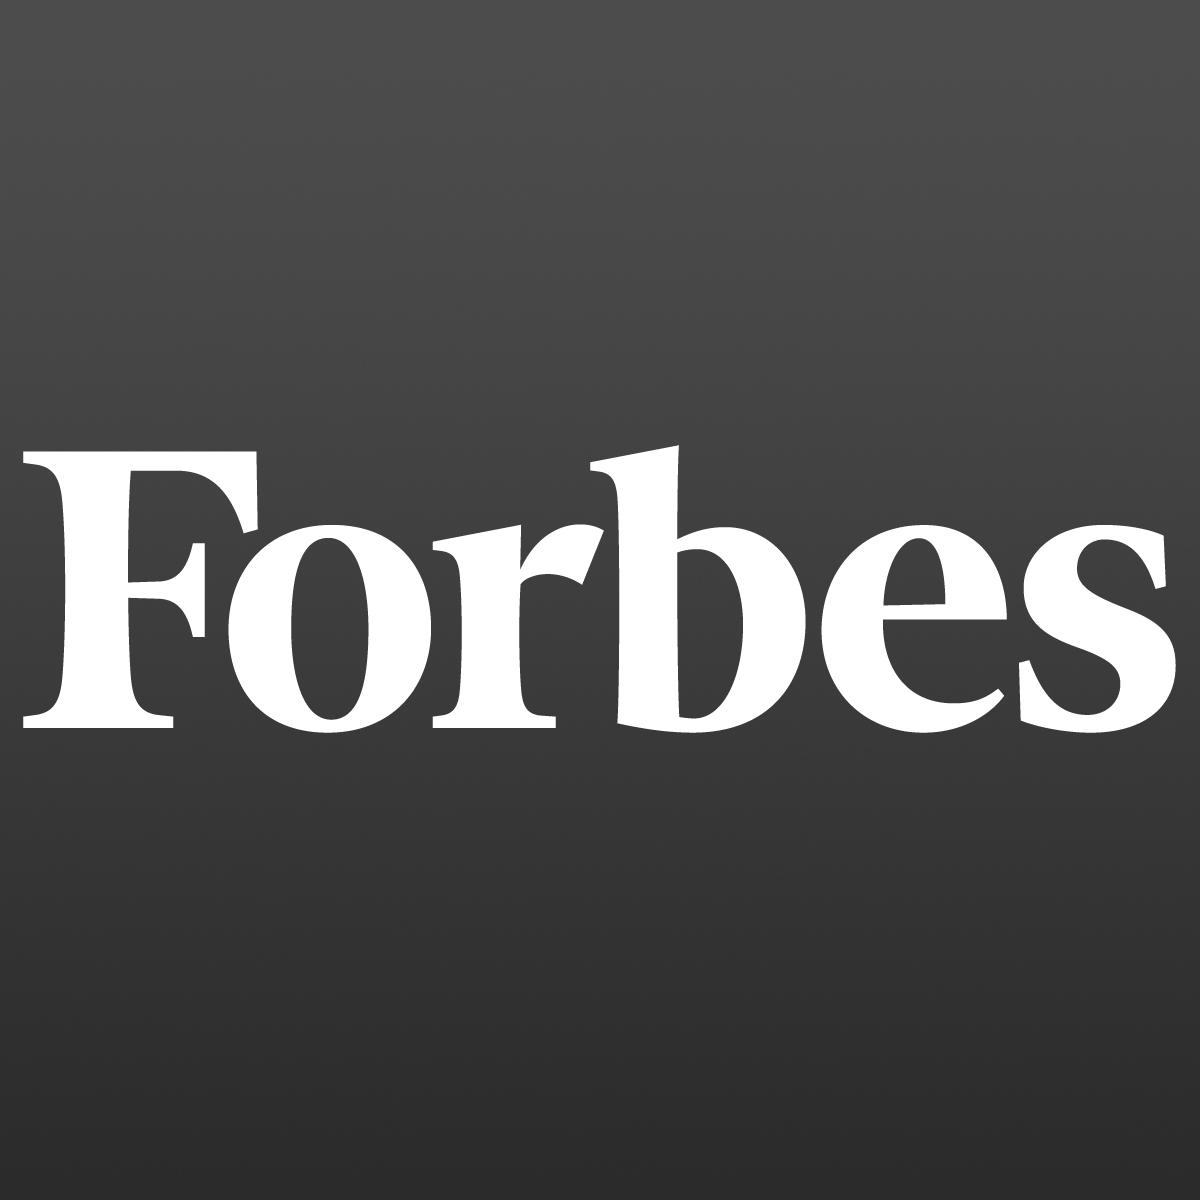 Forbes (magazine)